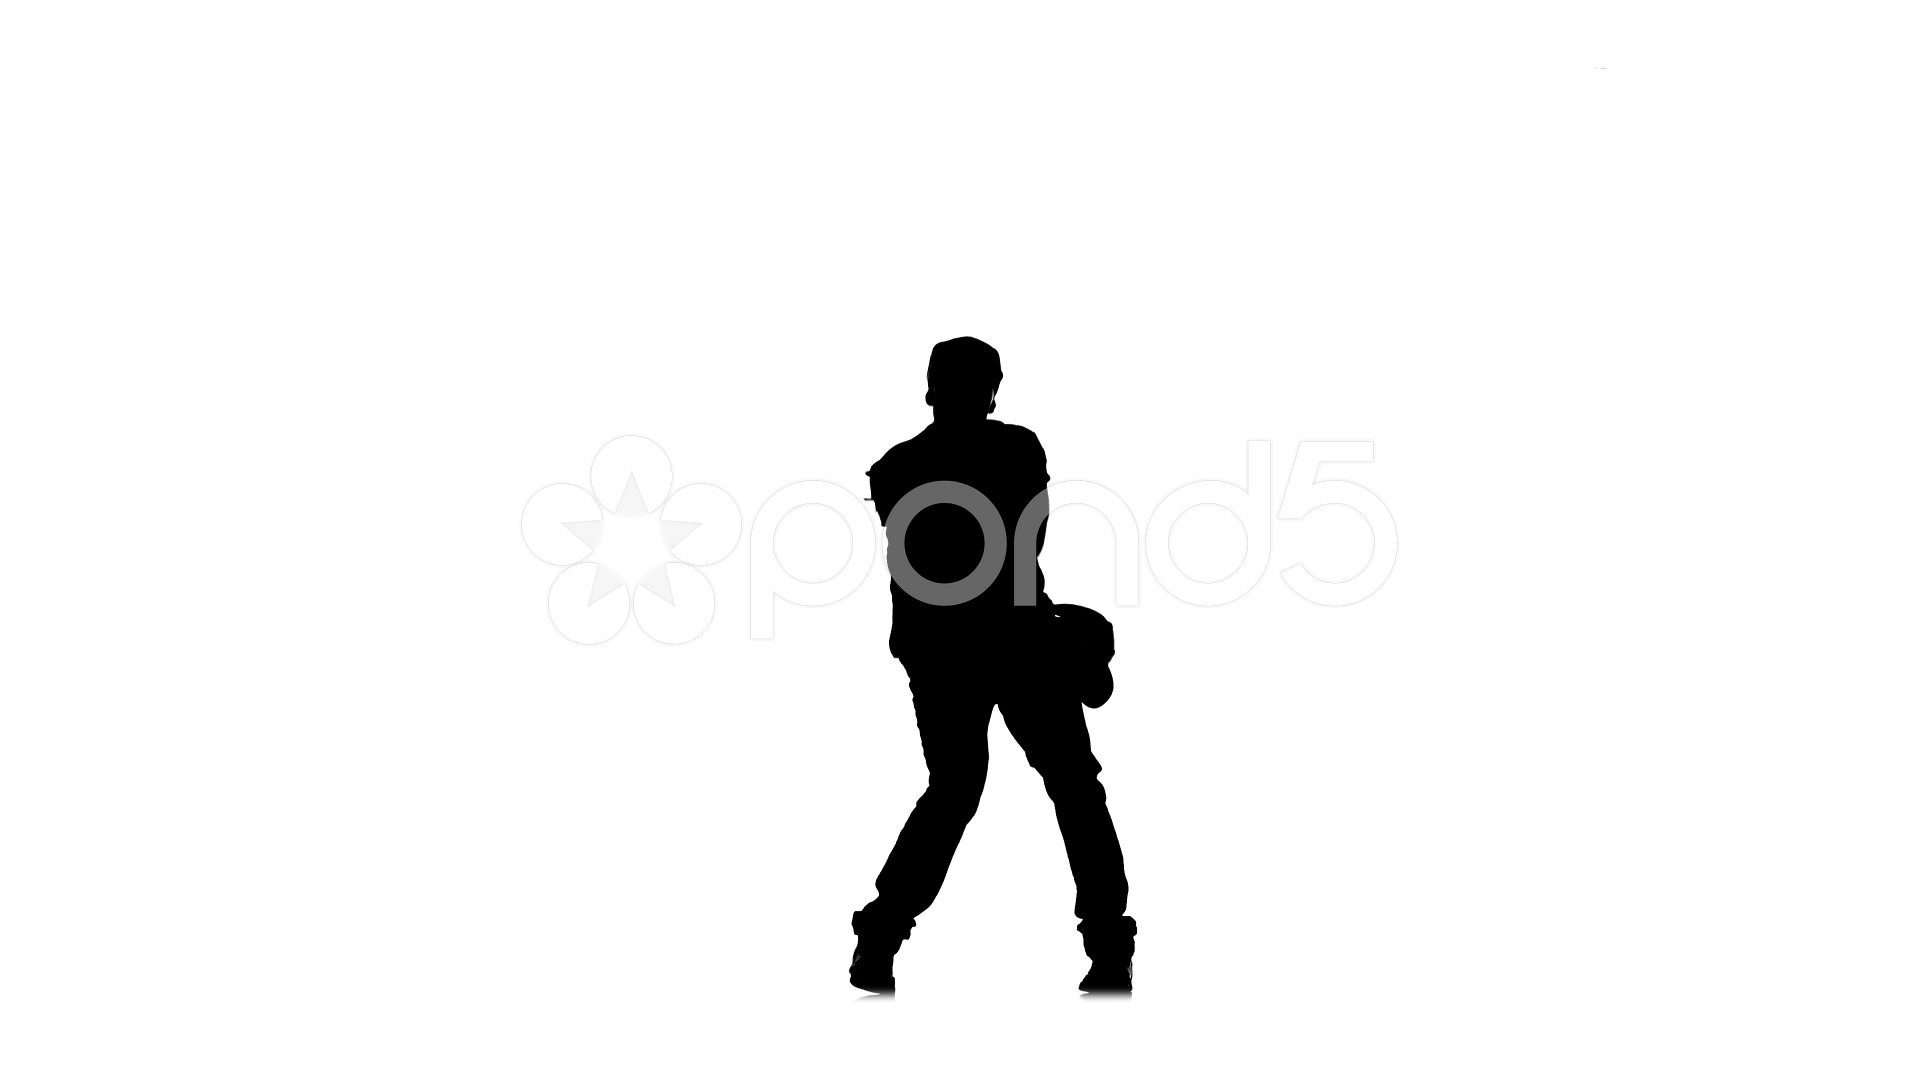 1920x1080 Stylish Man Dancing Hip Hop Kramp On White Background, Silhouette